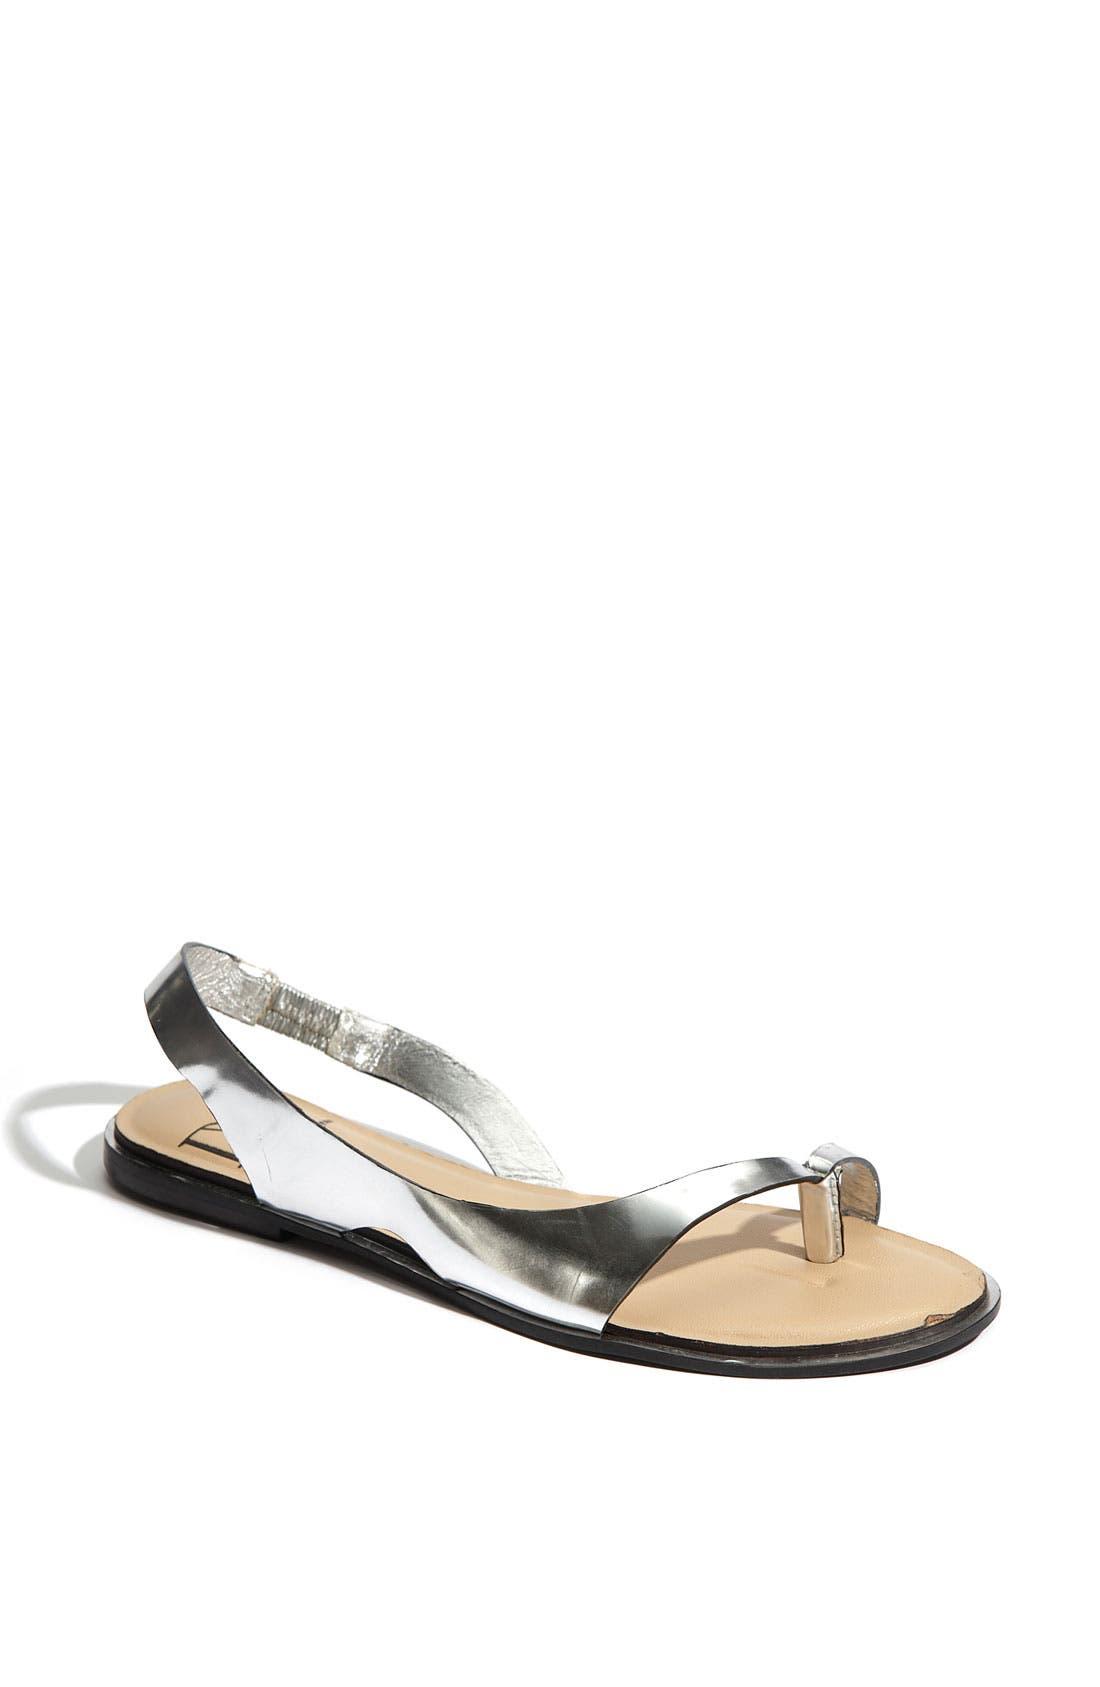 Alternate Image 1 Selected - Diane von Furstenberg 'Kaiti' Slingback Sandal